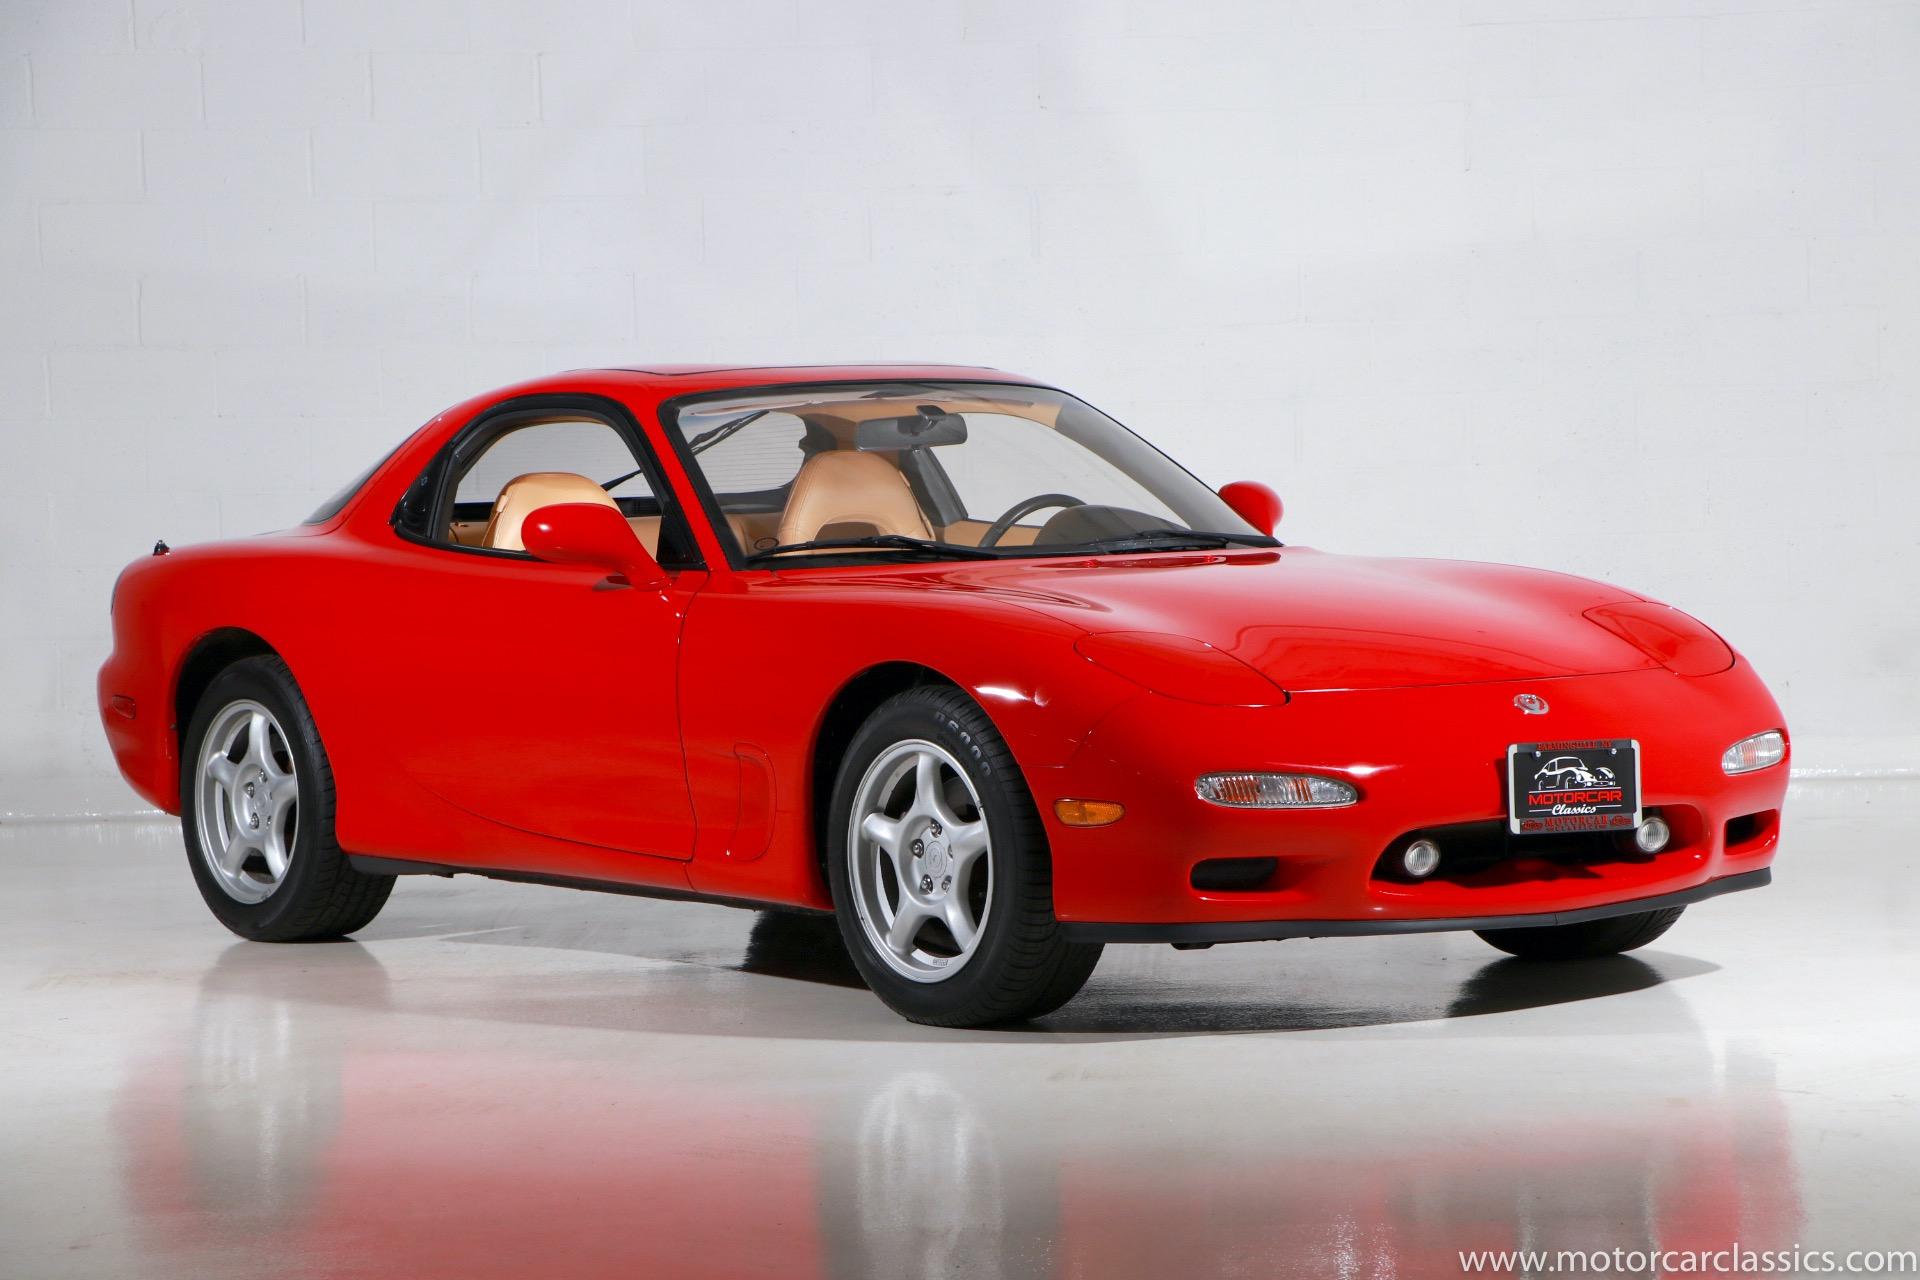 Used 1993 Mazda RX-7 Turbo | Farmingdale, NY